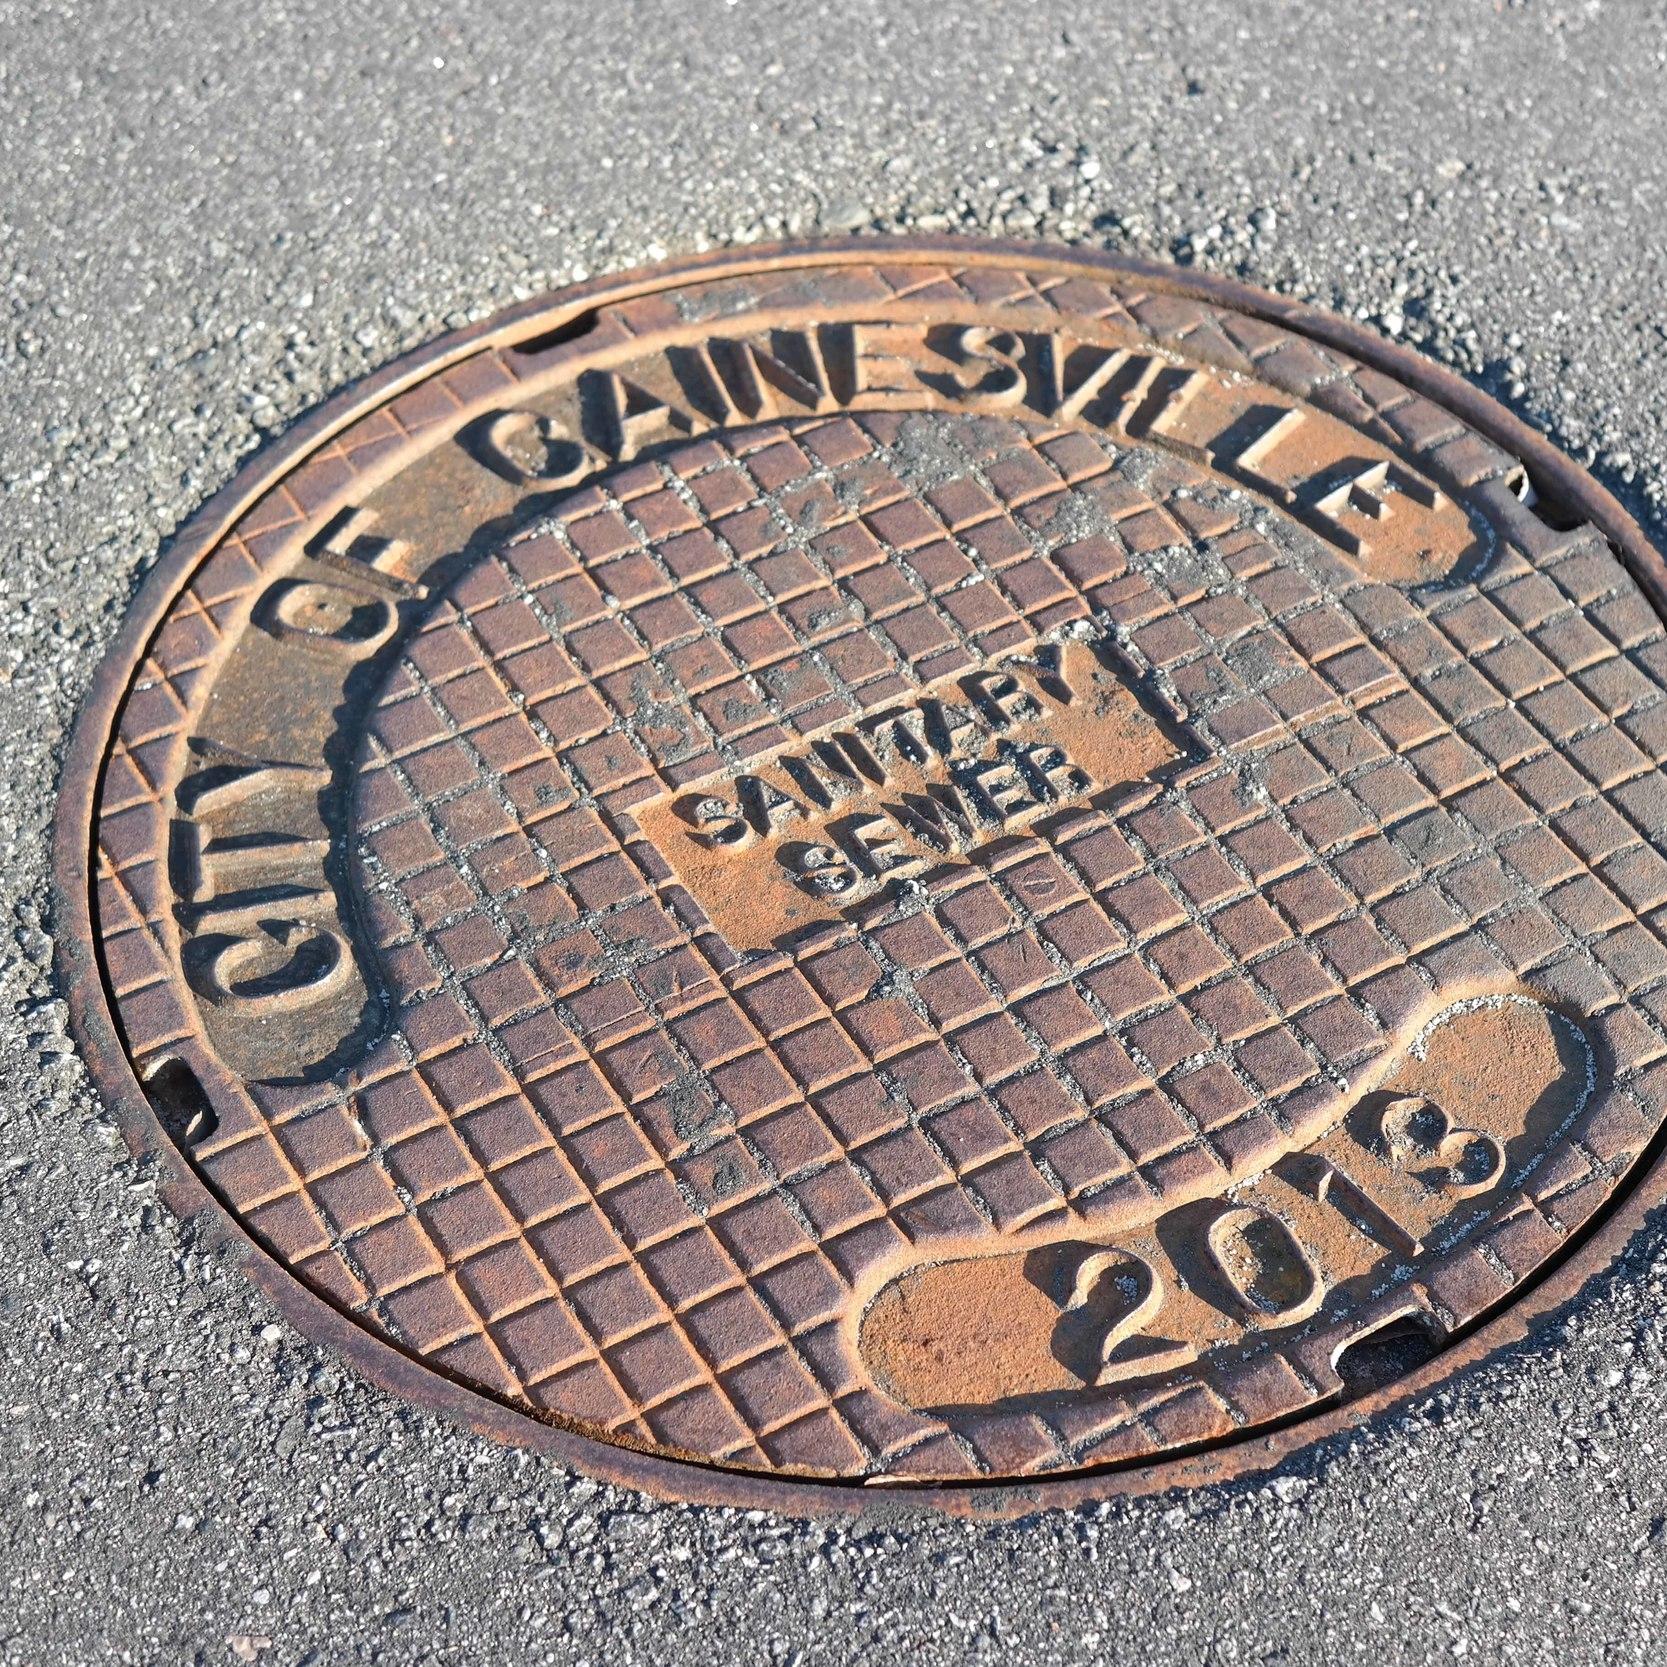 Utilities Sewer Manhole